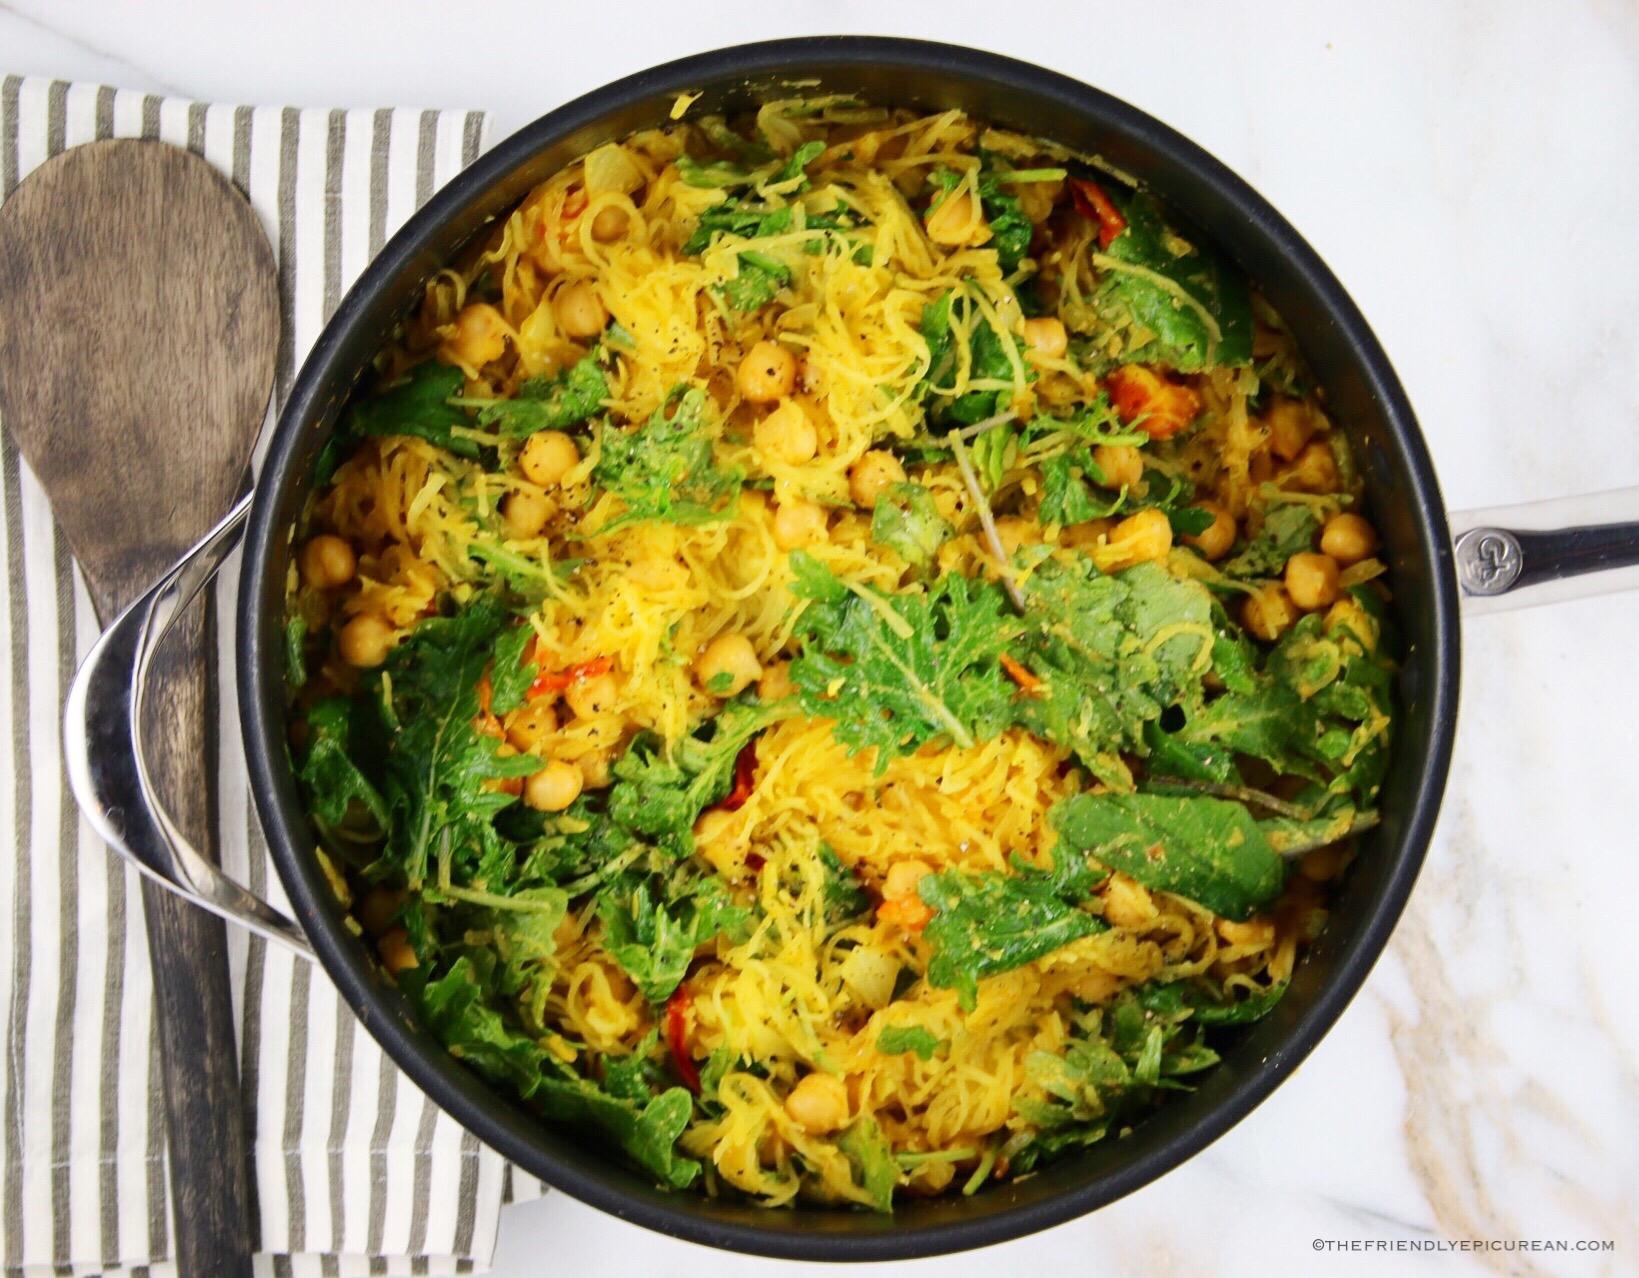 Spaghetti Squash with Kale and Chickpeas (vegan, gluten free)